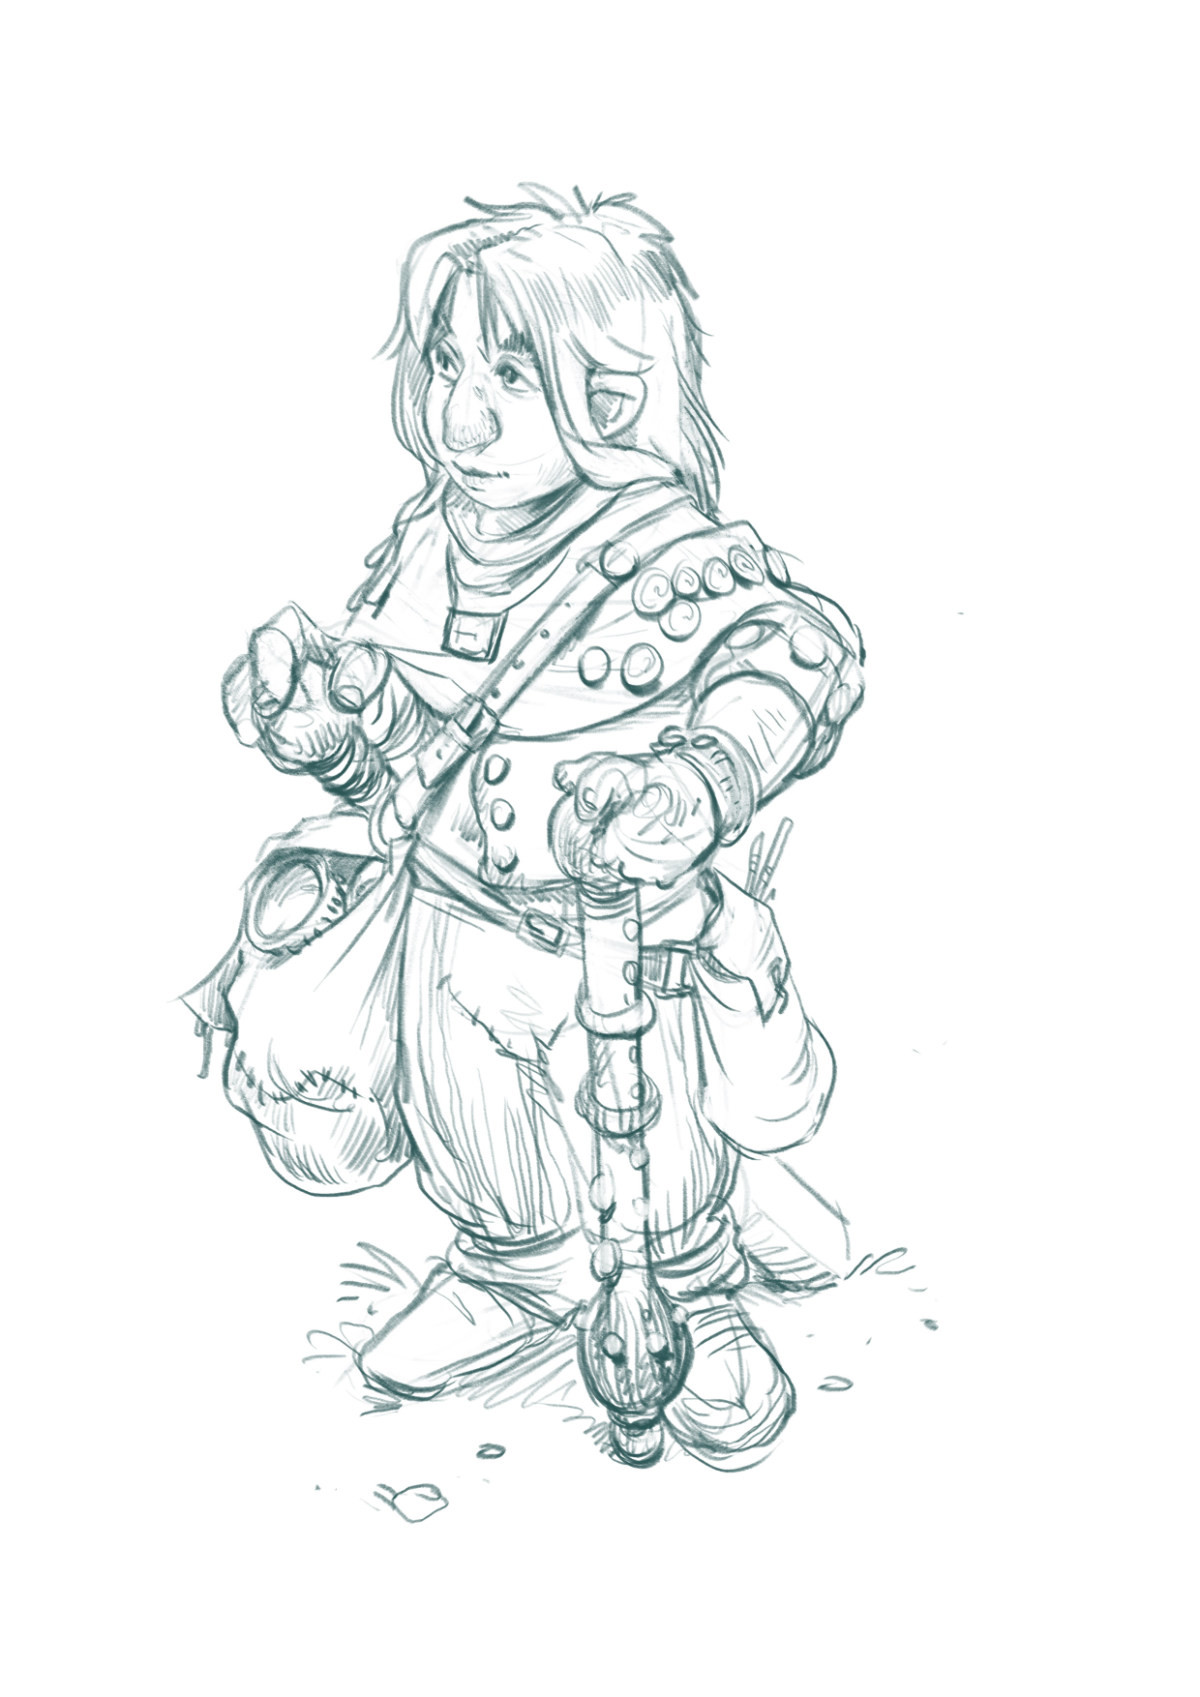 Treasure hunter.